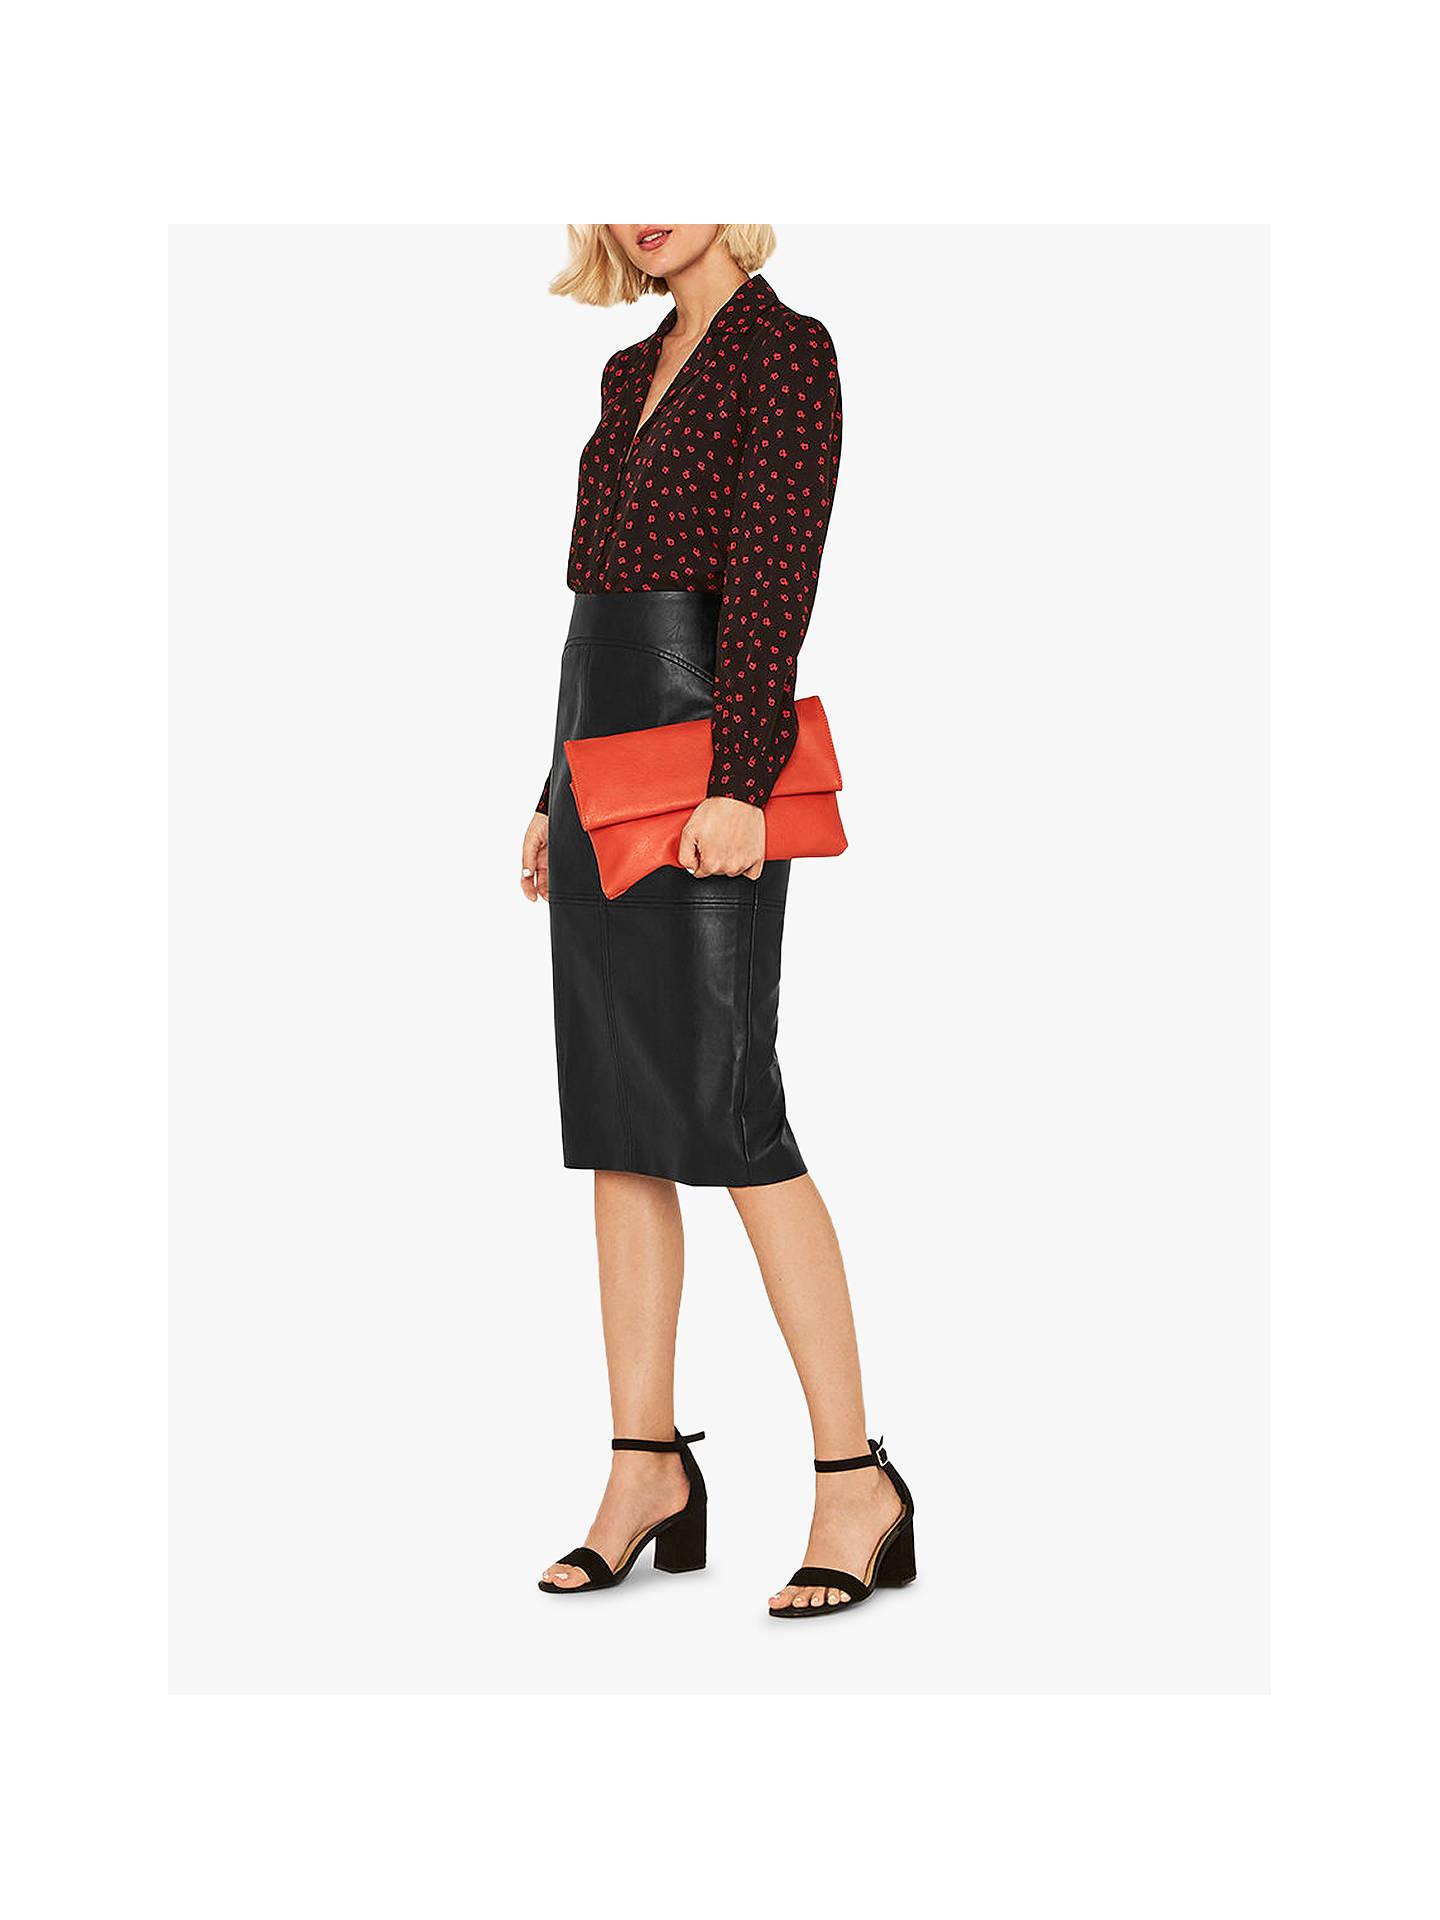 22dd220ec894 Buy Oasis Faux Leather Skirt, Black, 6 Online at johnlewis.com ...